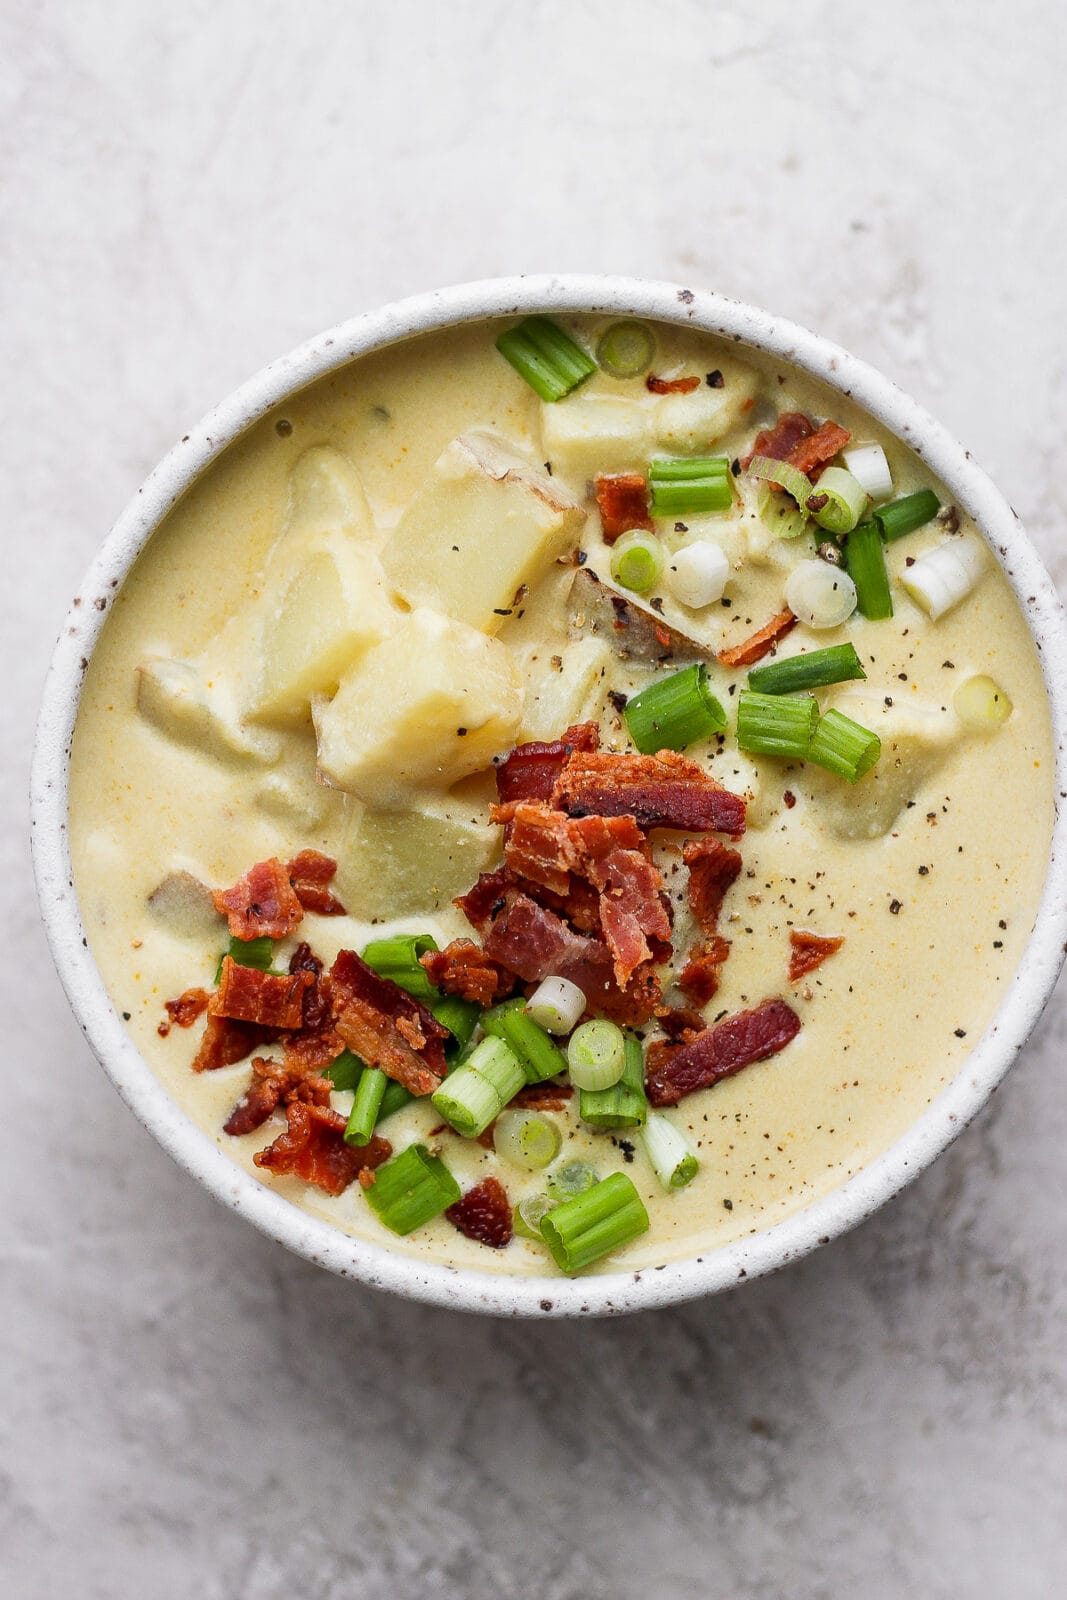 Bowl of loaded baked potato soup.